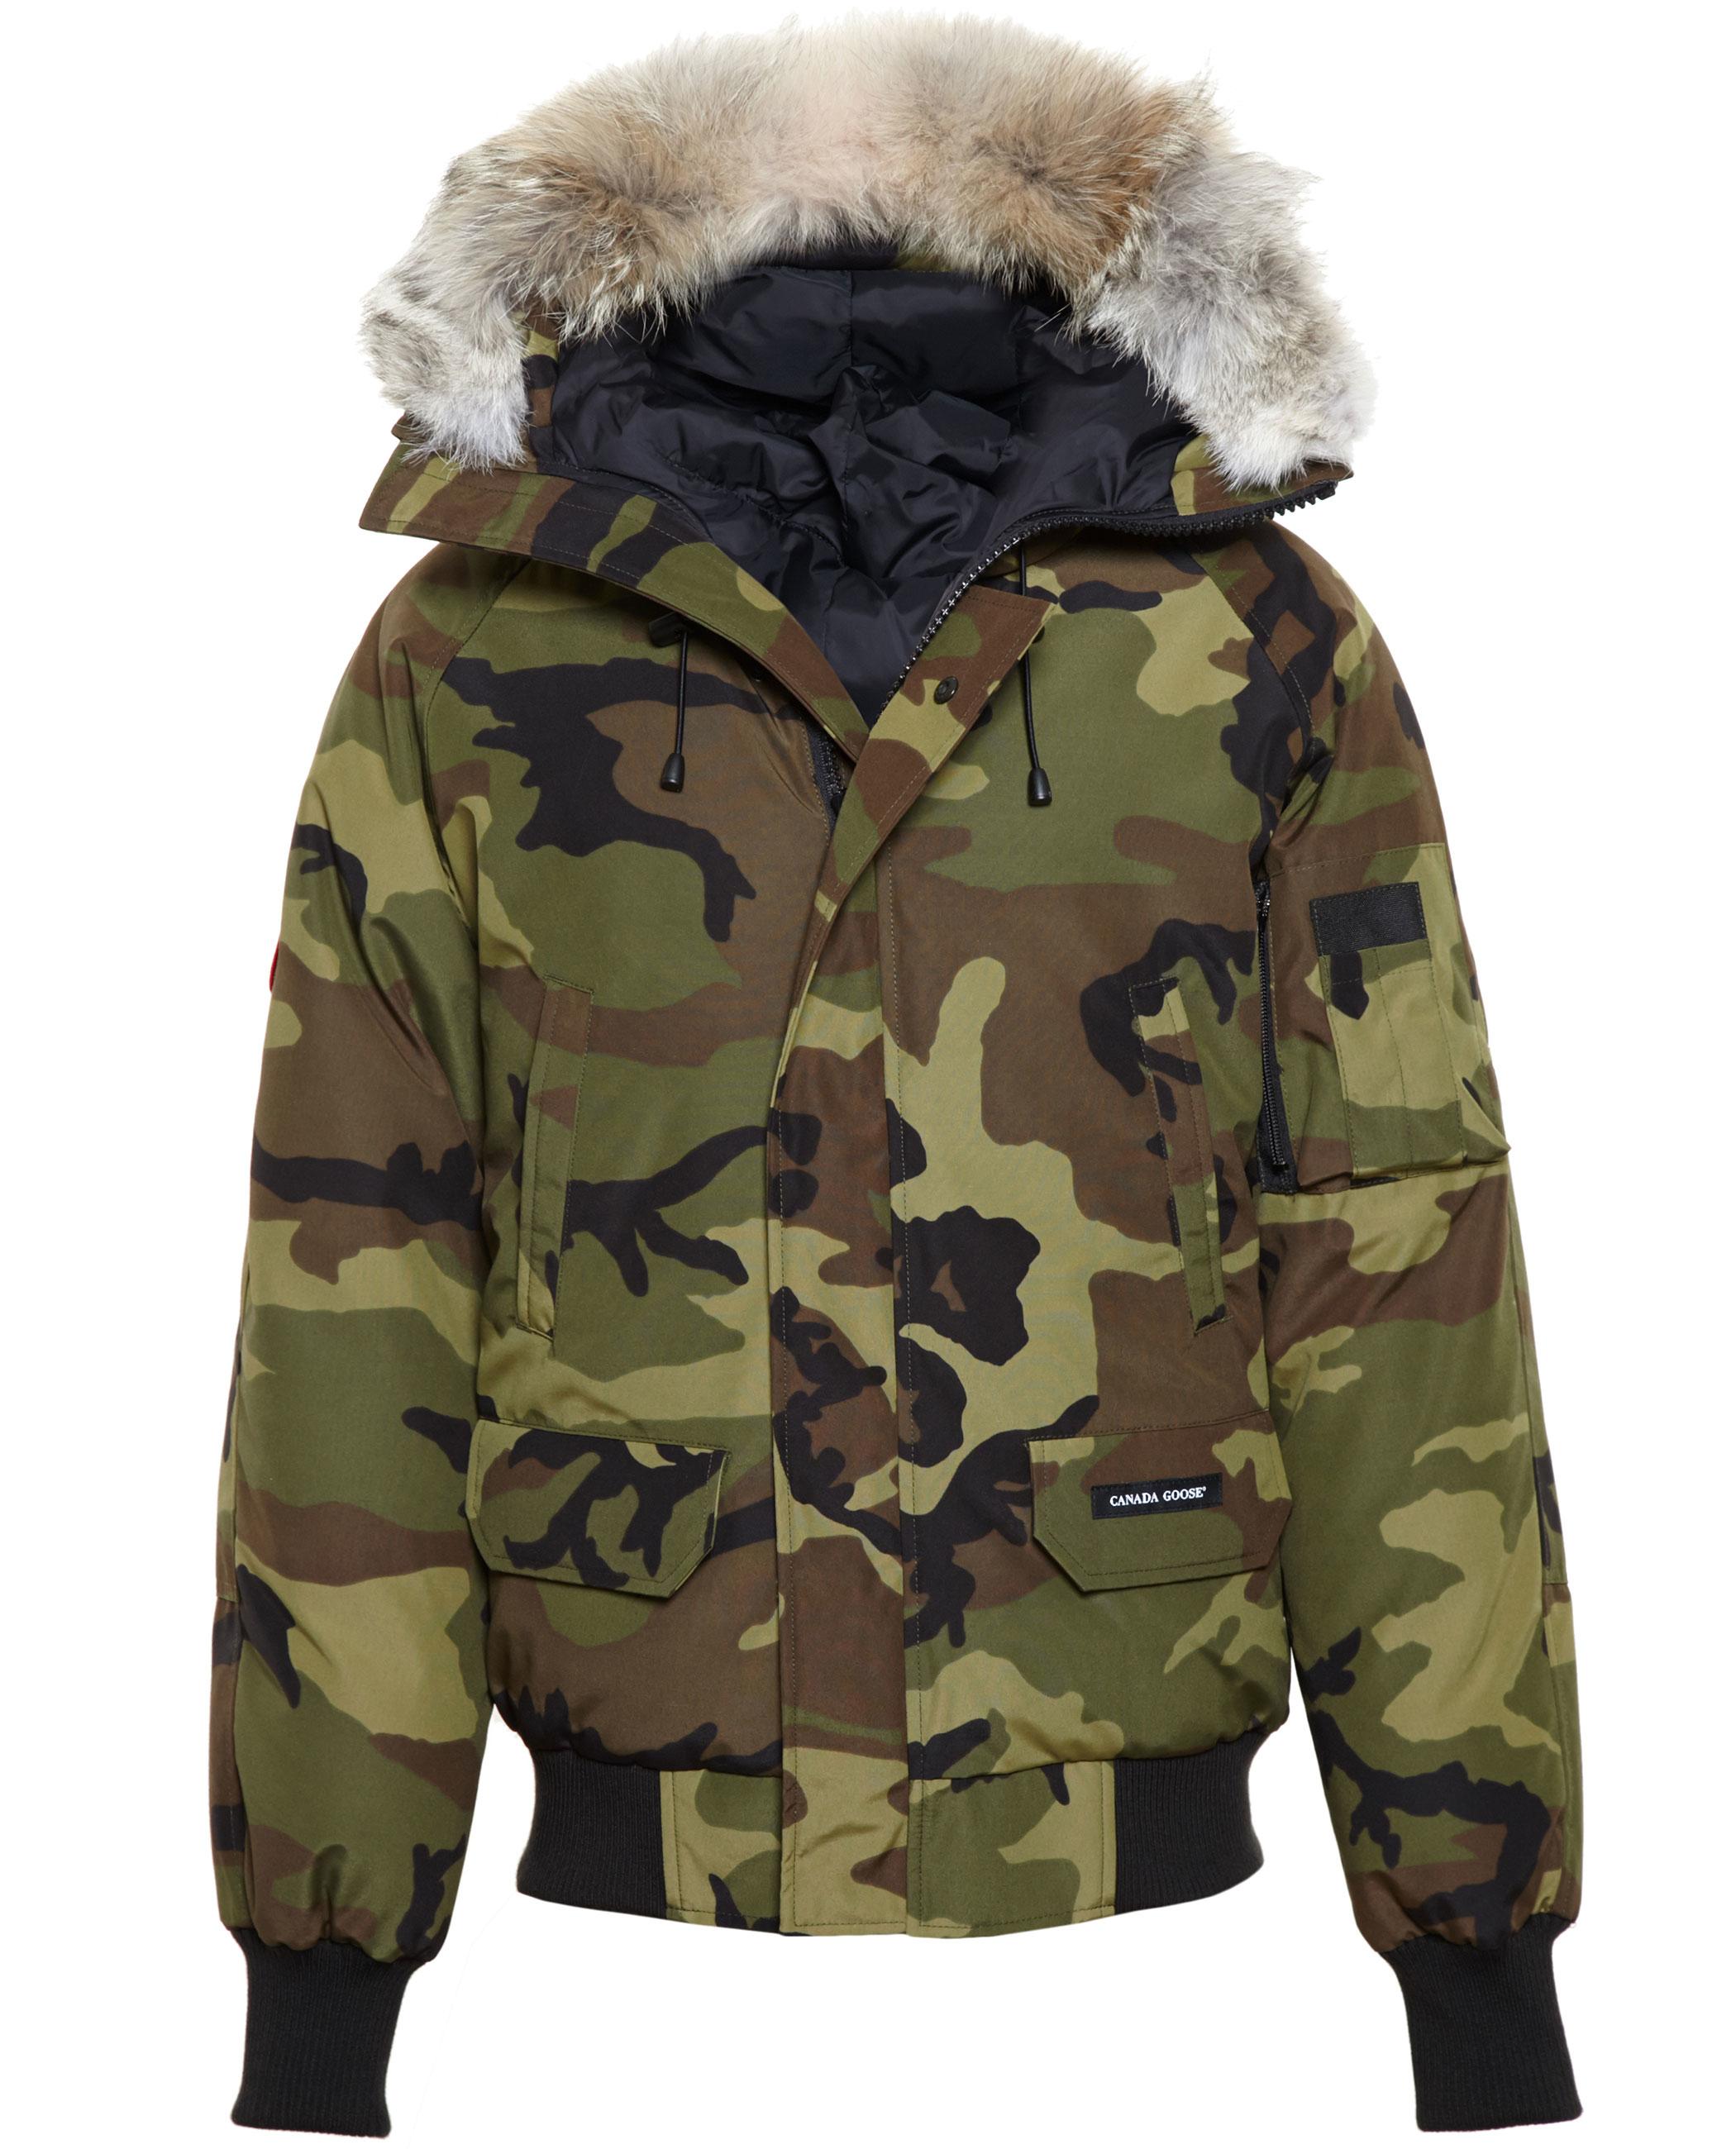 canada goose camouflage parka canada goose jackets online fake. Black Bedroom Furniture Sets. Home Design Ideas